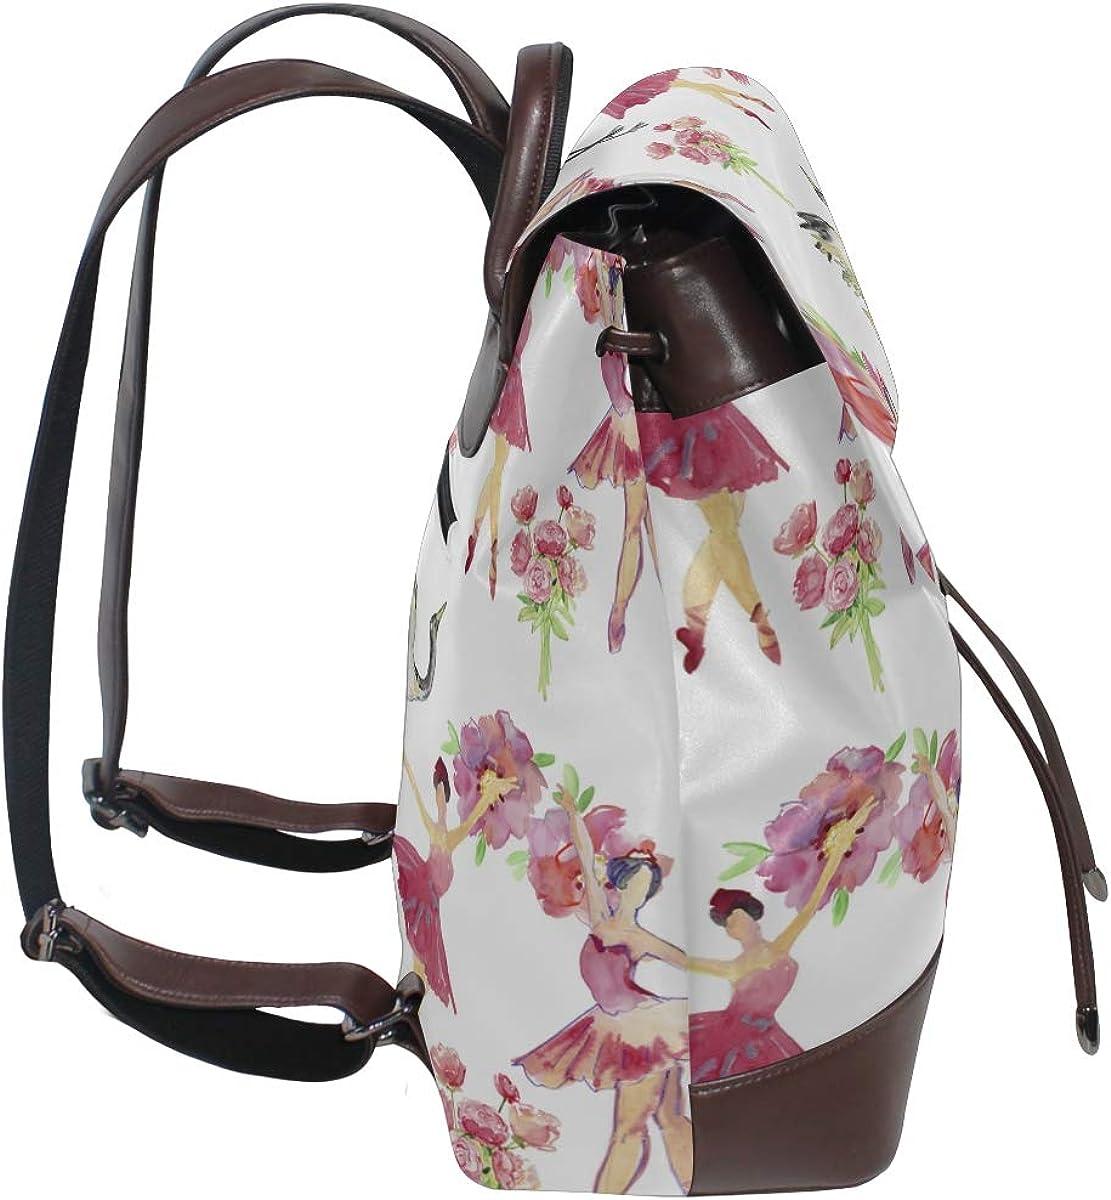 Cute Ballerina Dancing Leather Backpack Backpack Bag Leather Drawstring Waterproof Fashion Womens Bag Fashion Shoulder Bag For Women